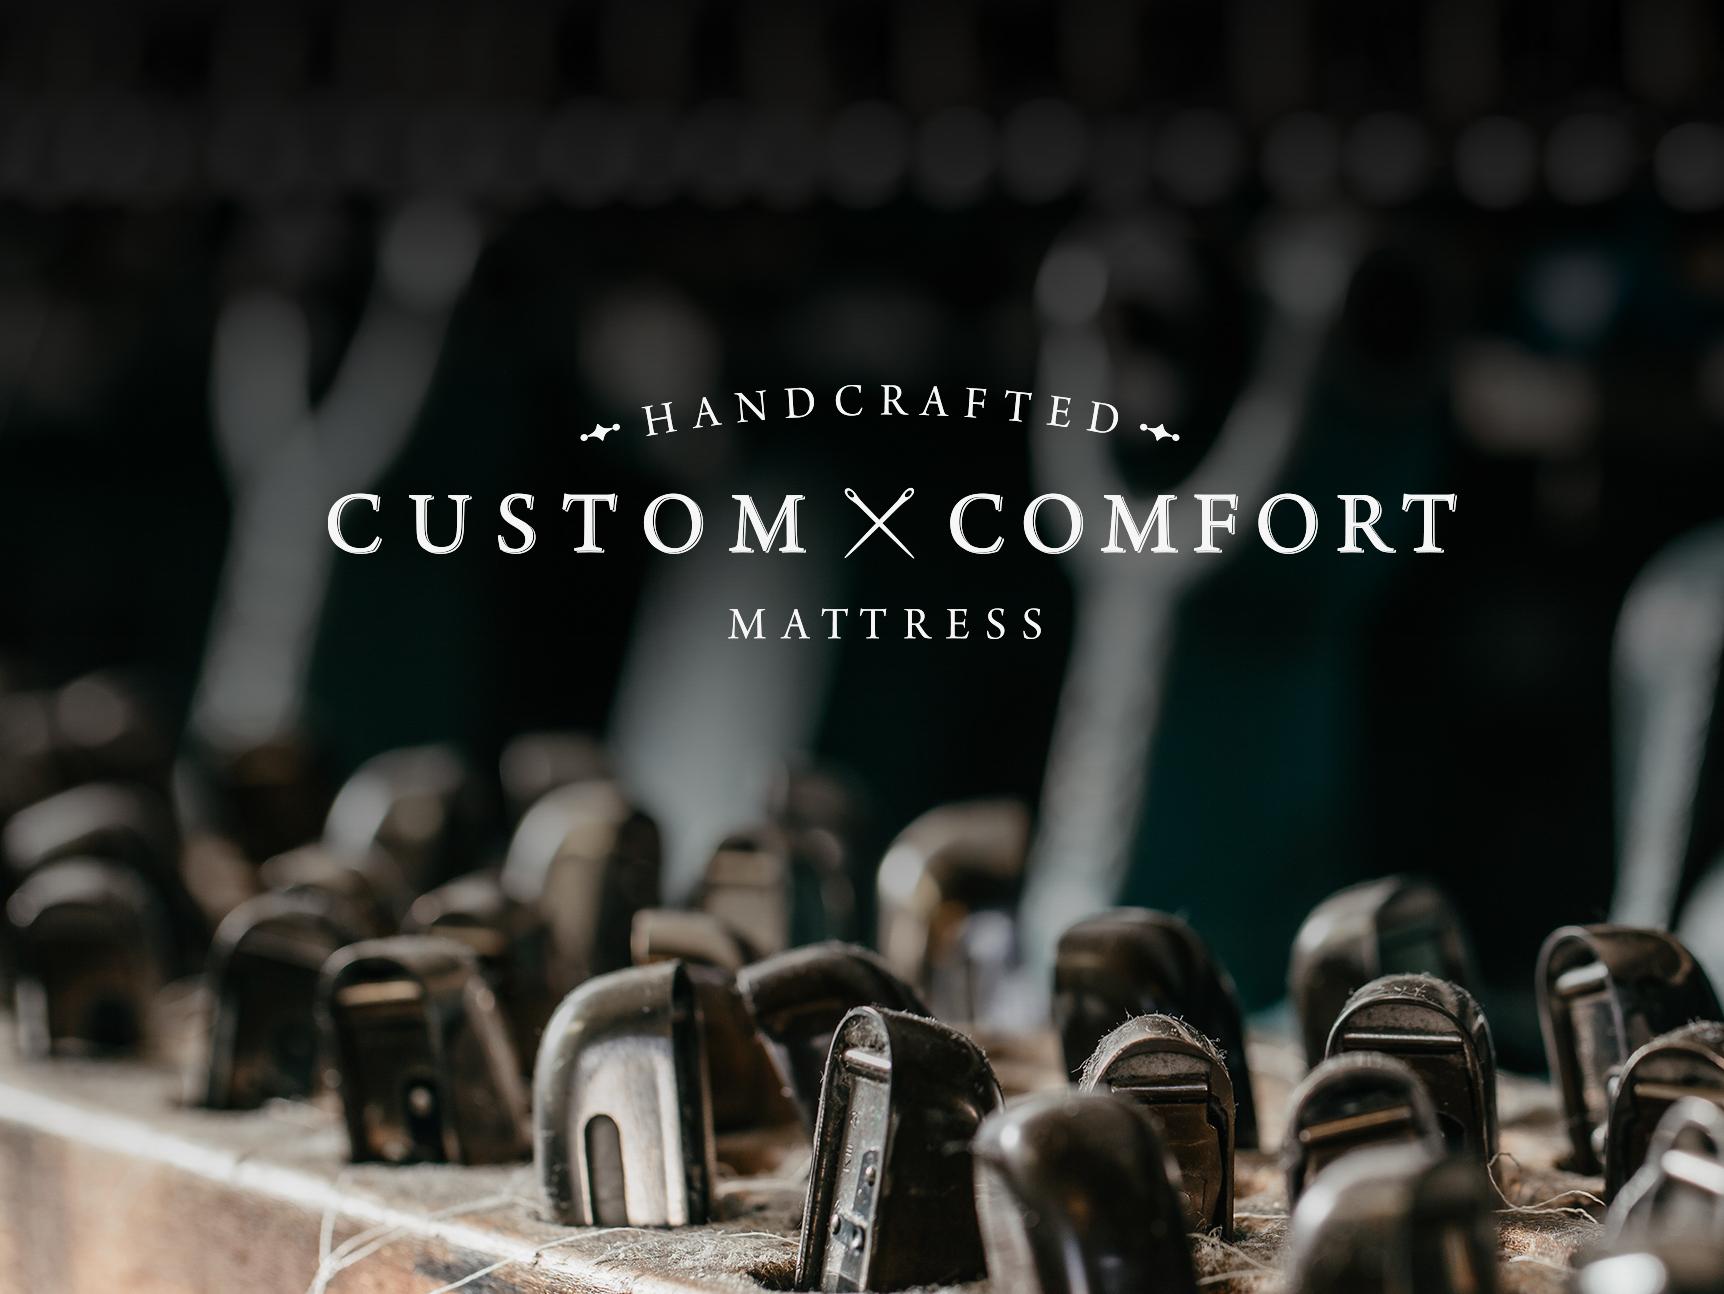 rodfoster_customcomfort.201.JPG